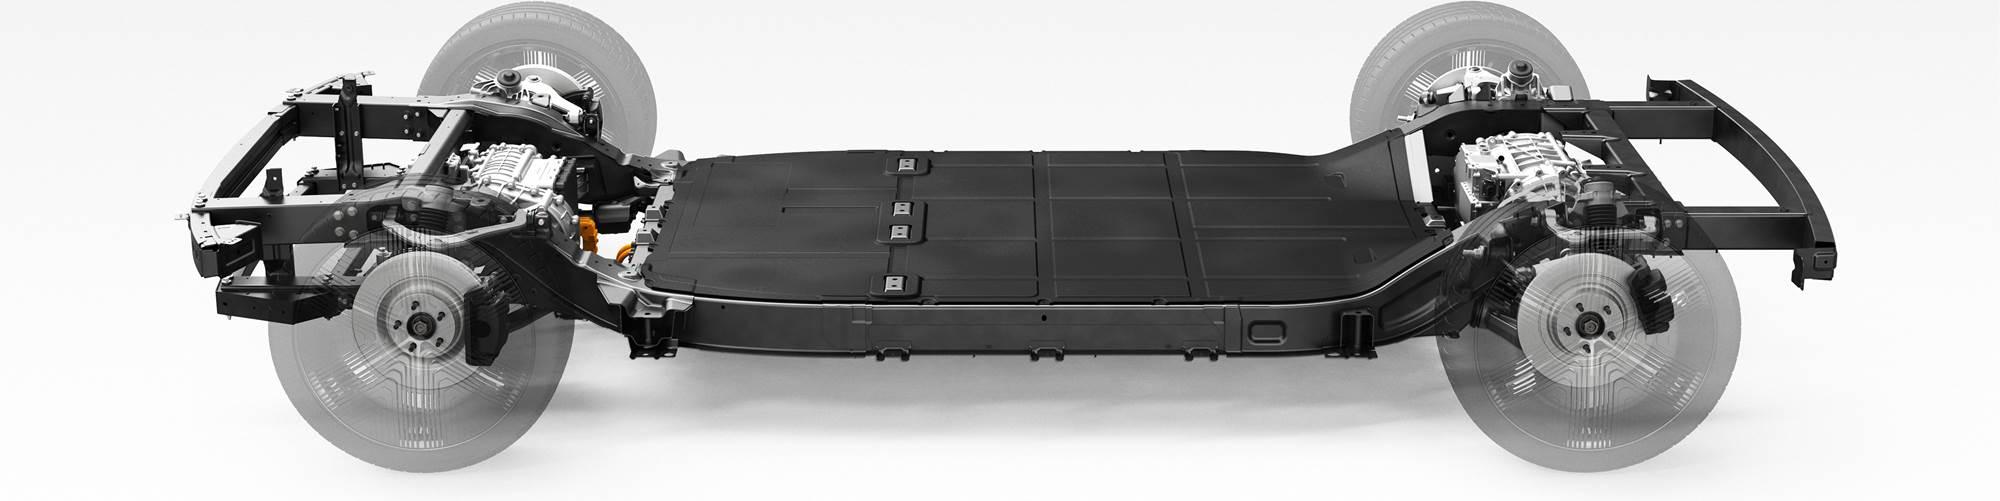 Hyundai/Kia will use Canoo's skateboard platform for future EVs